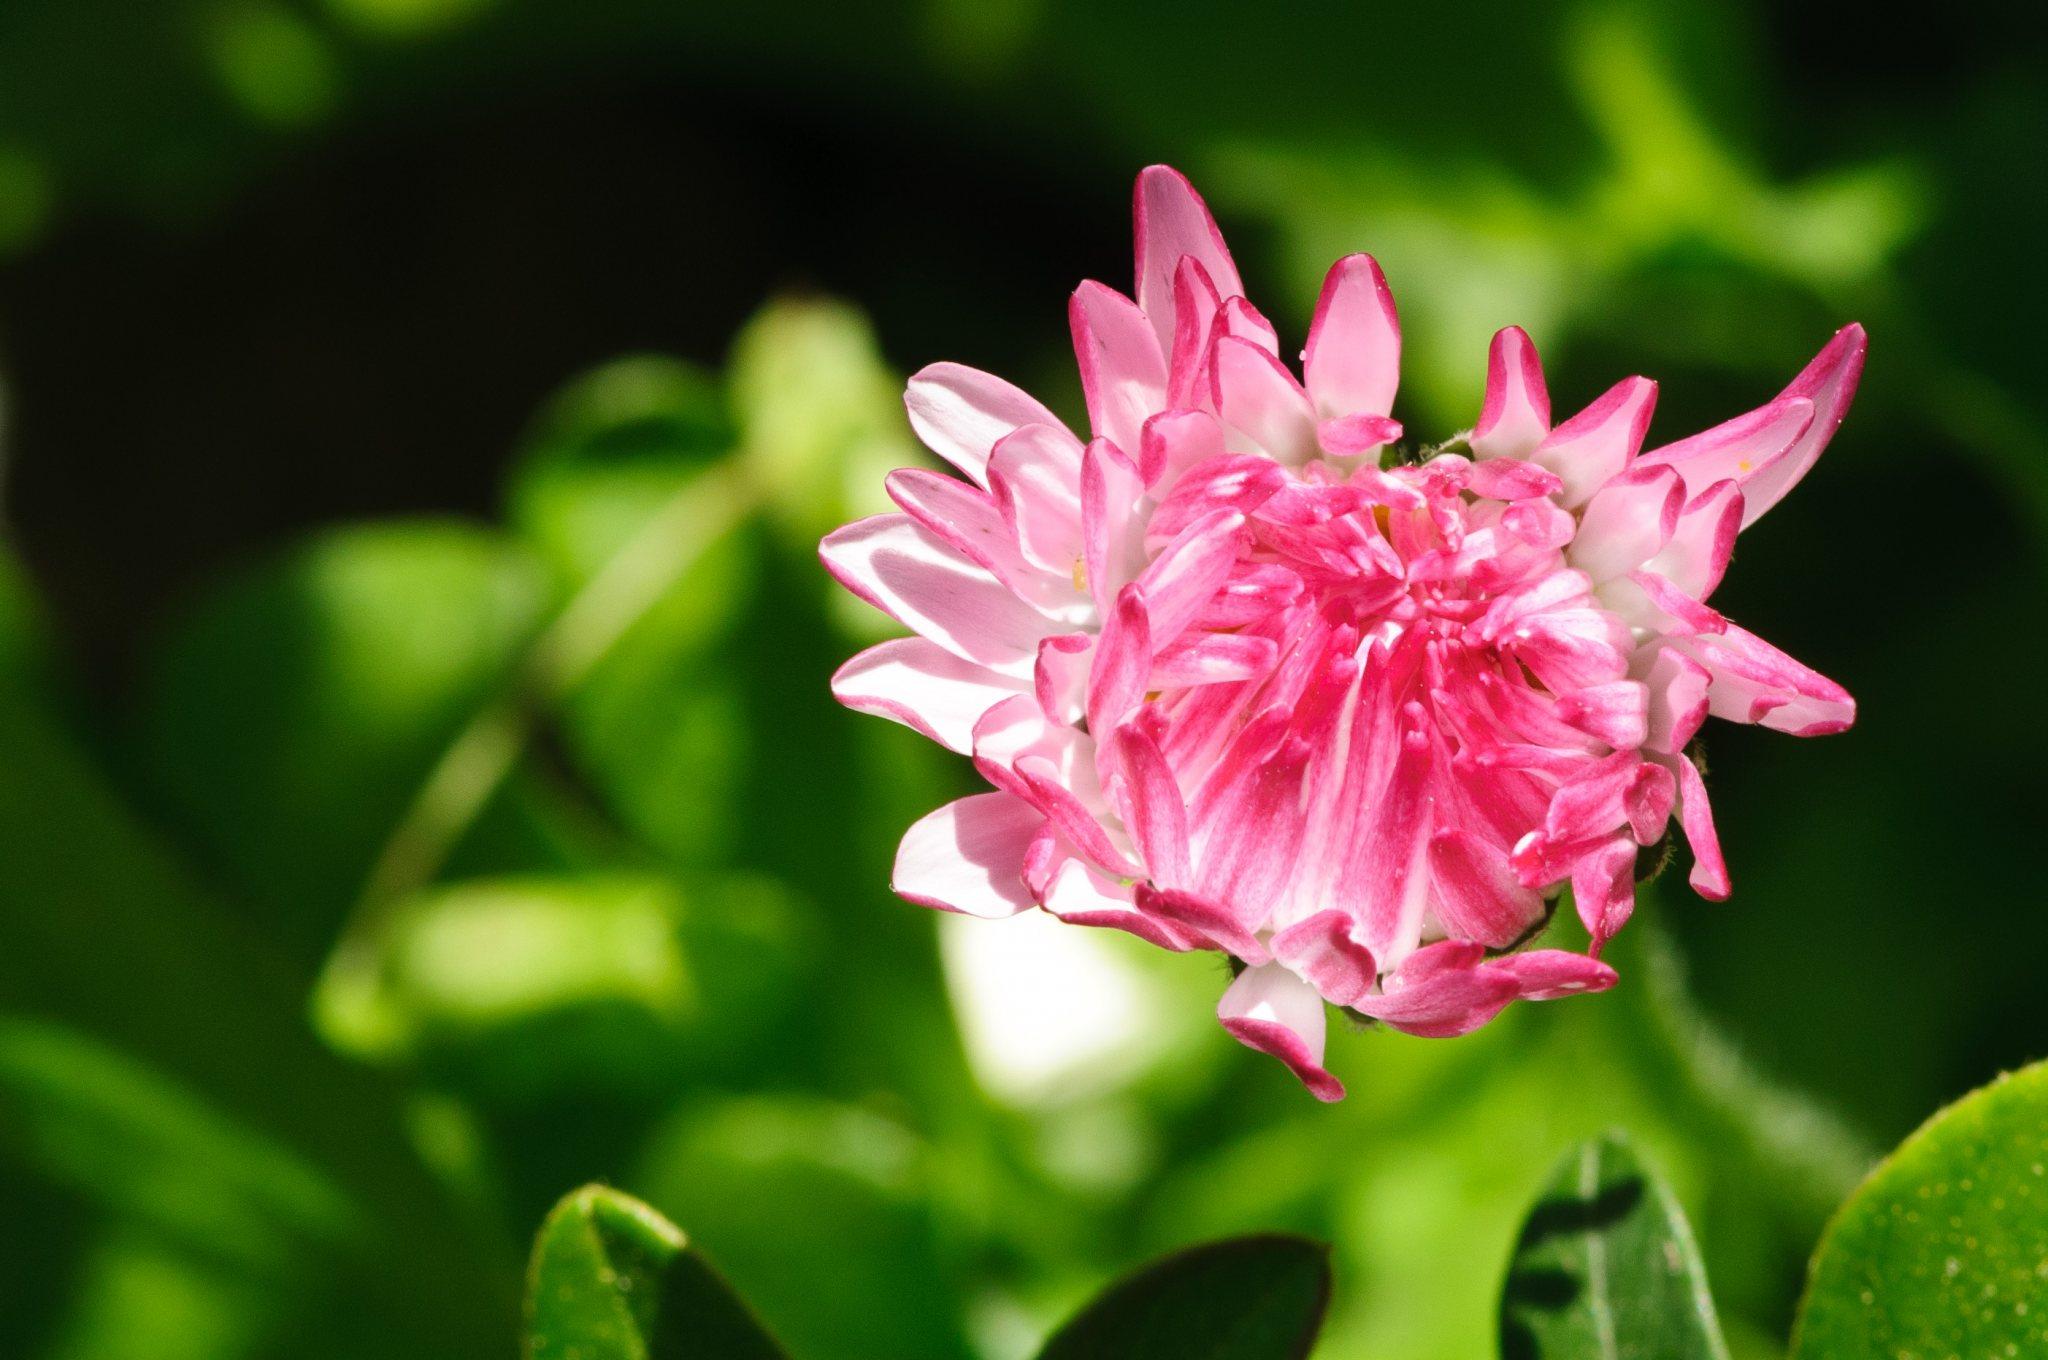 bronces_fleurs-10.jpg